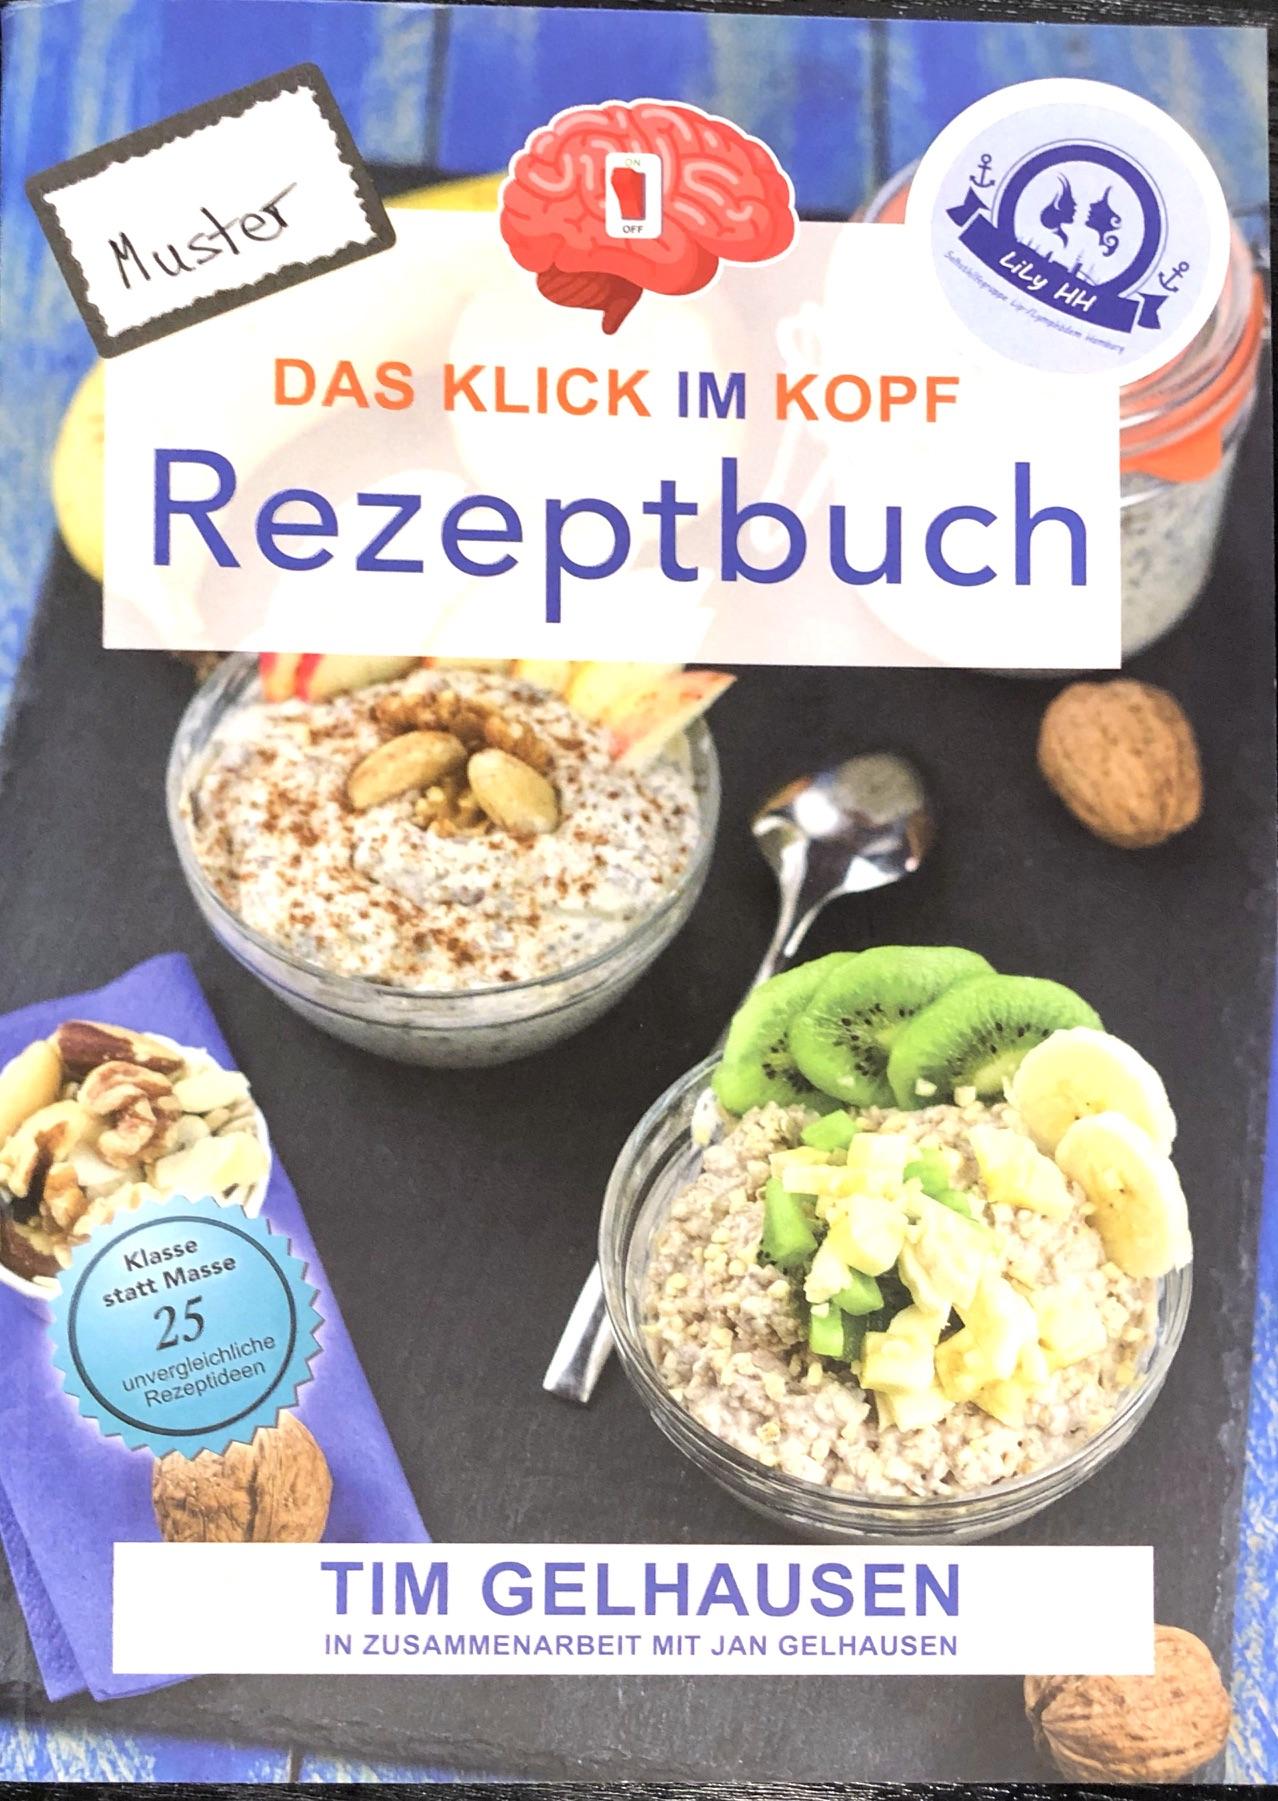 1-2019-Klick-im-Kopf-Rezeptbuch